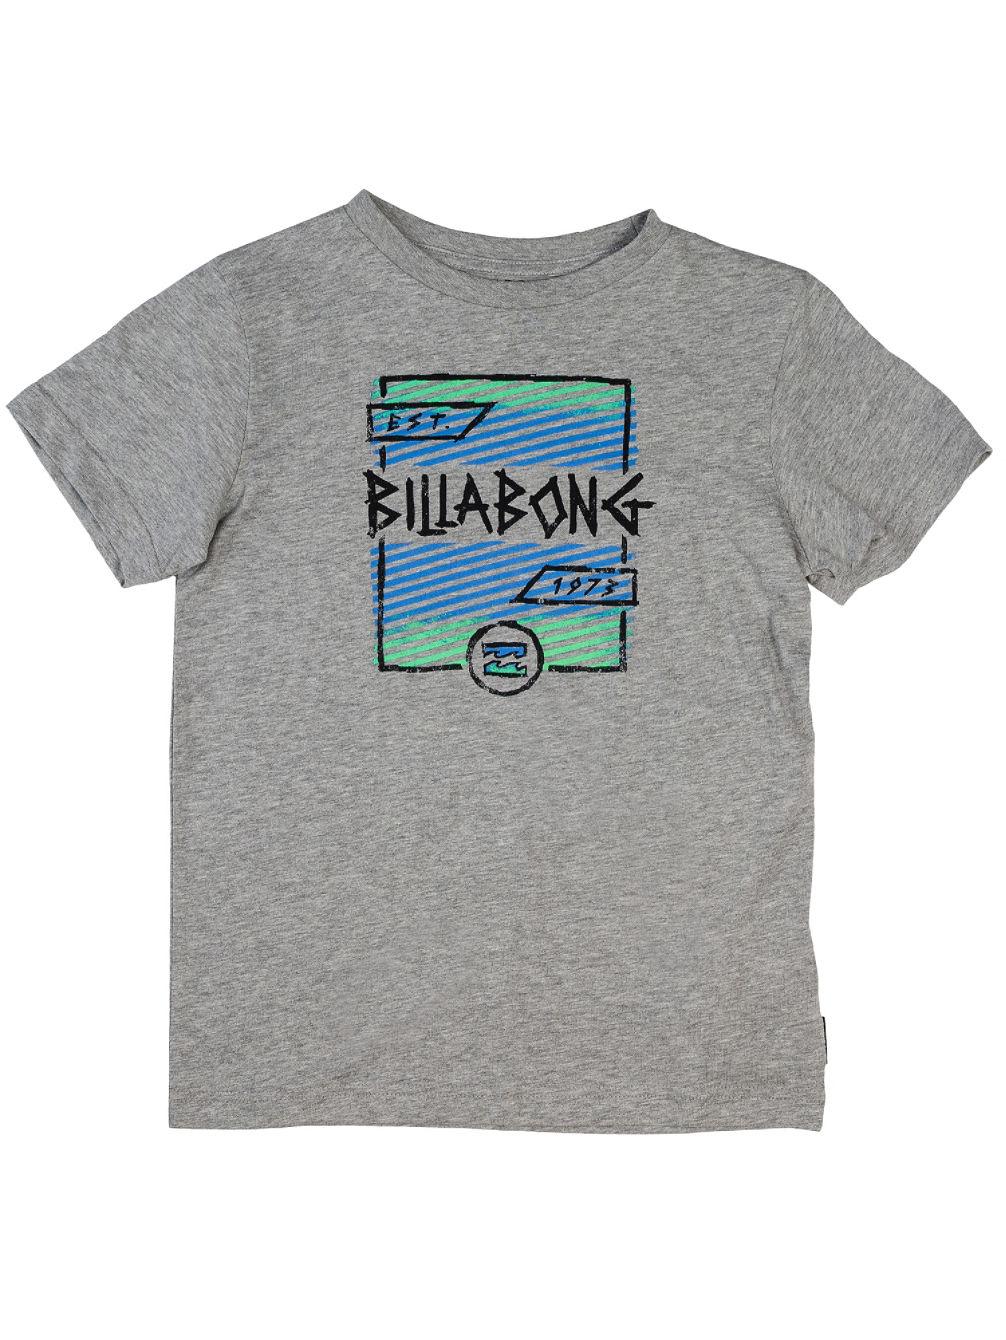 billabong duration t shirt jungen online kaufen bei blue. Black Bedroom Furniture Sets. Home Design Ideas